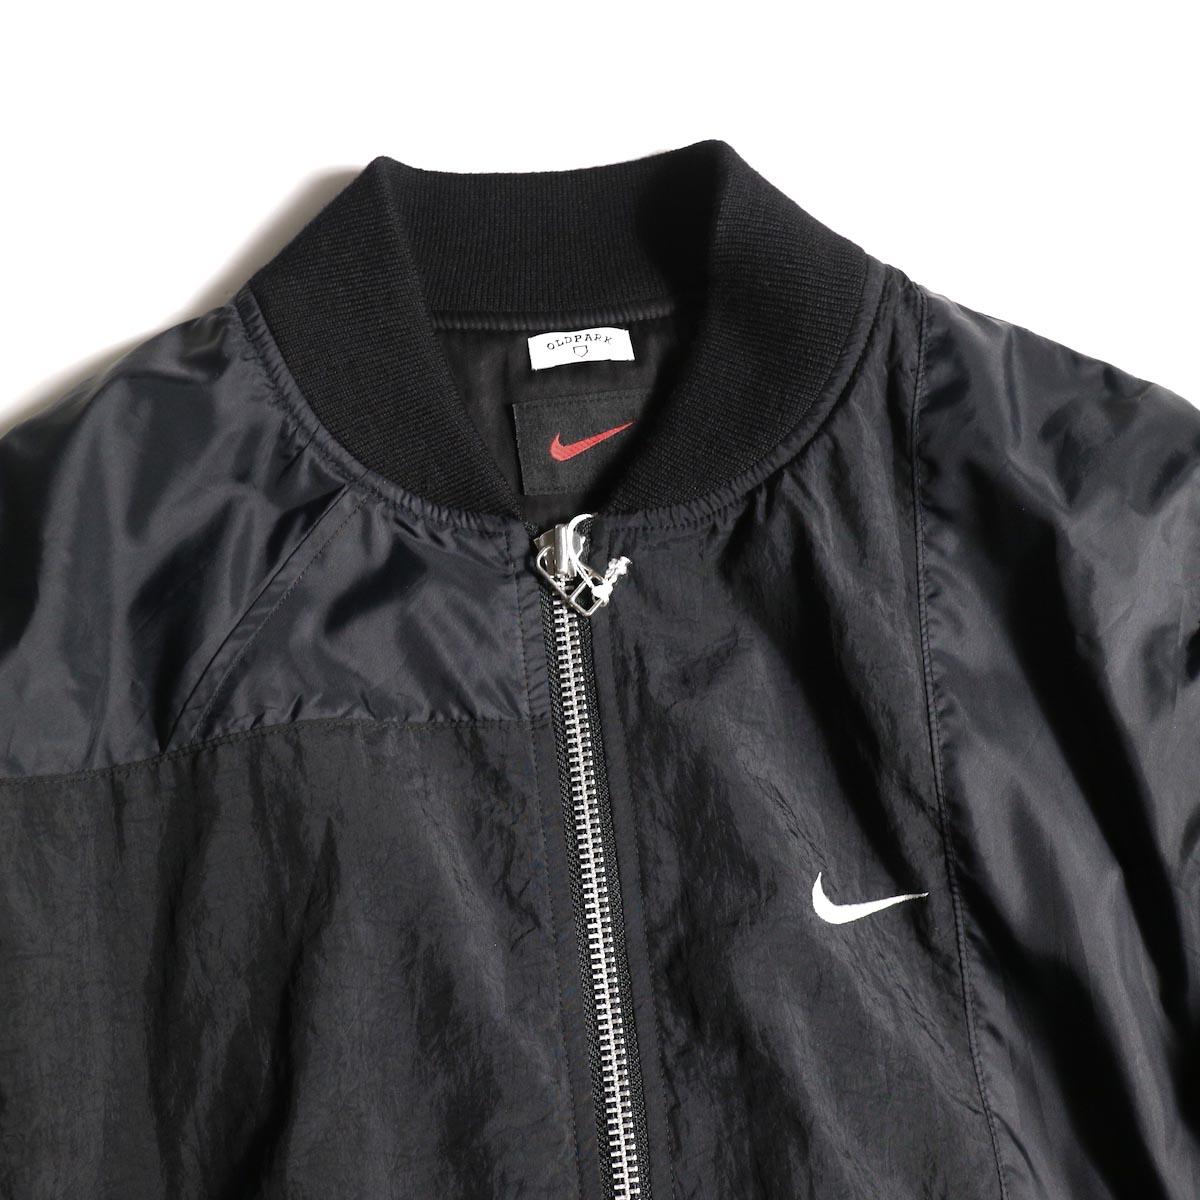 OLD PARK / Flight Jacket Sports Nike リブ